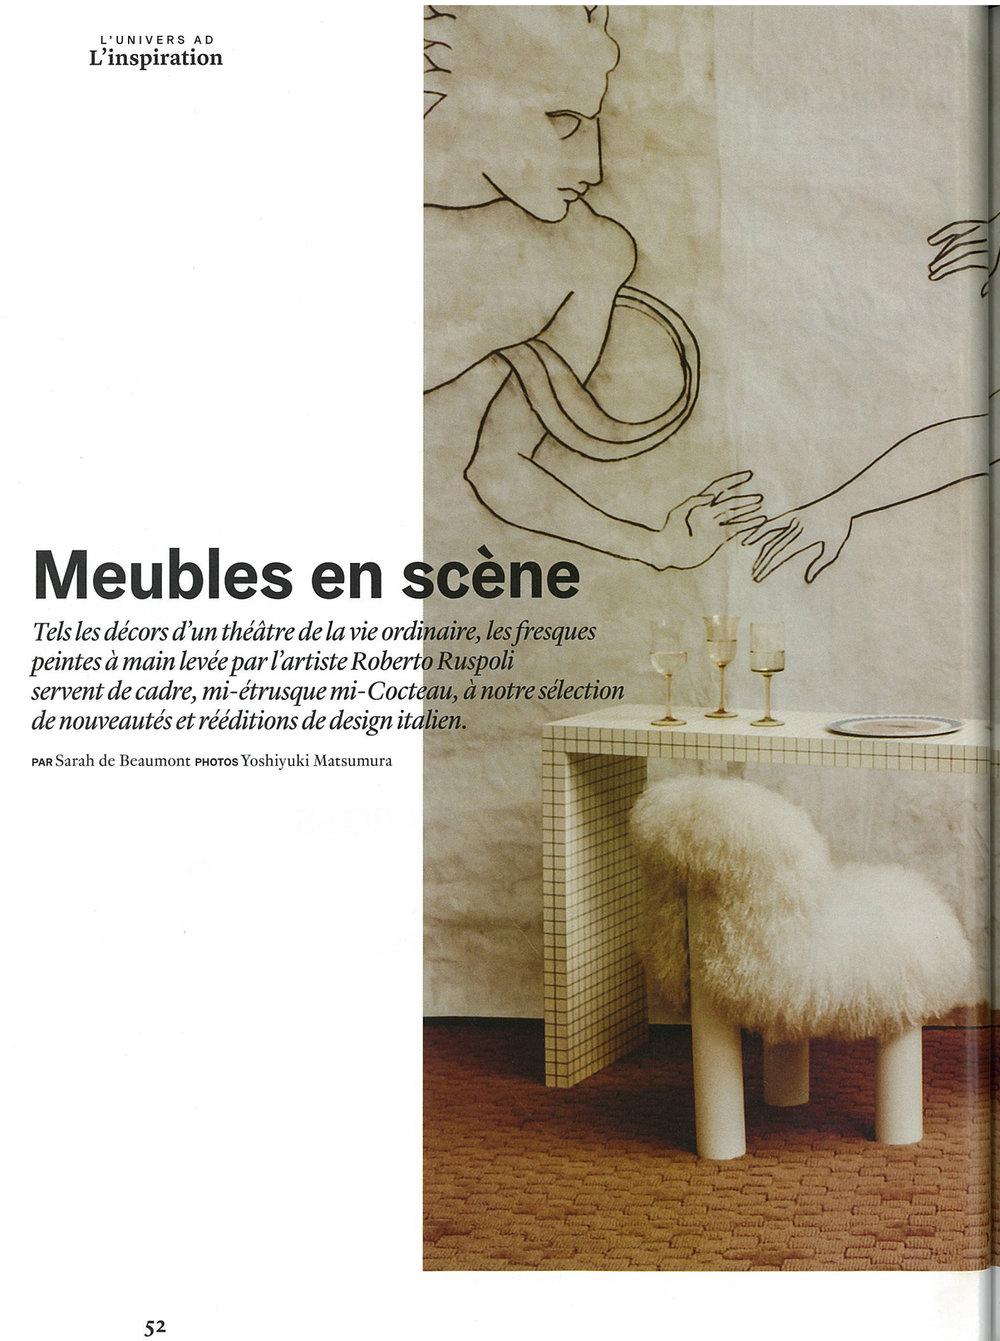 MC_AD Magazine_Mars:AVRIL19_1.jpg